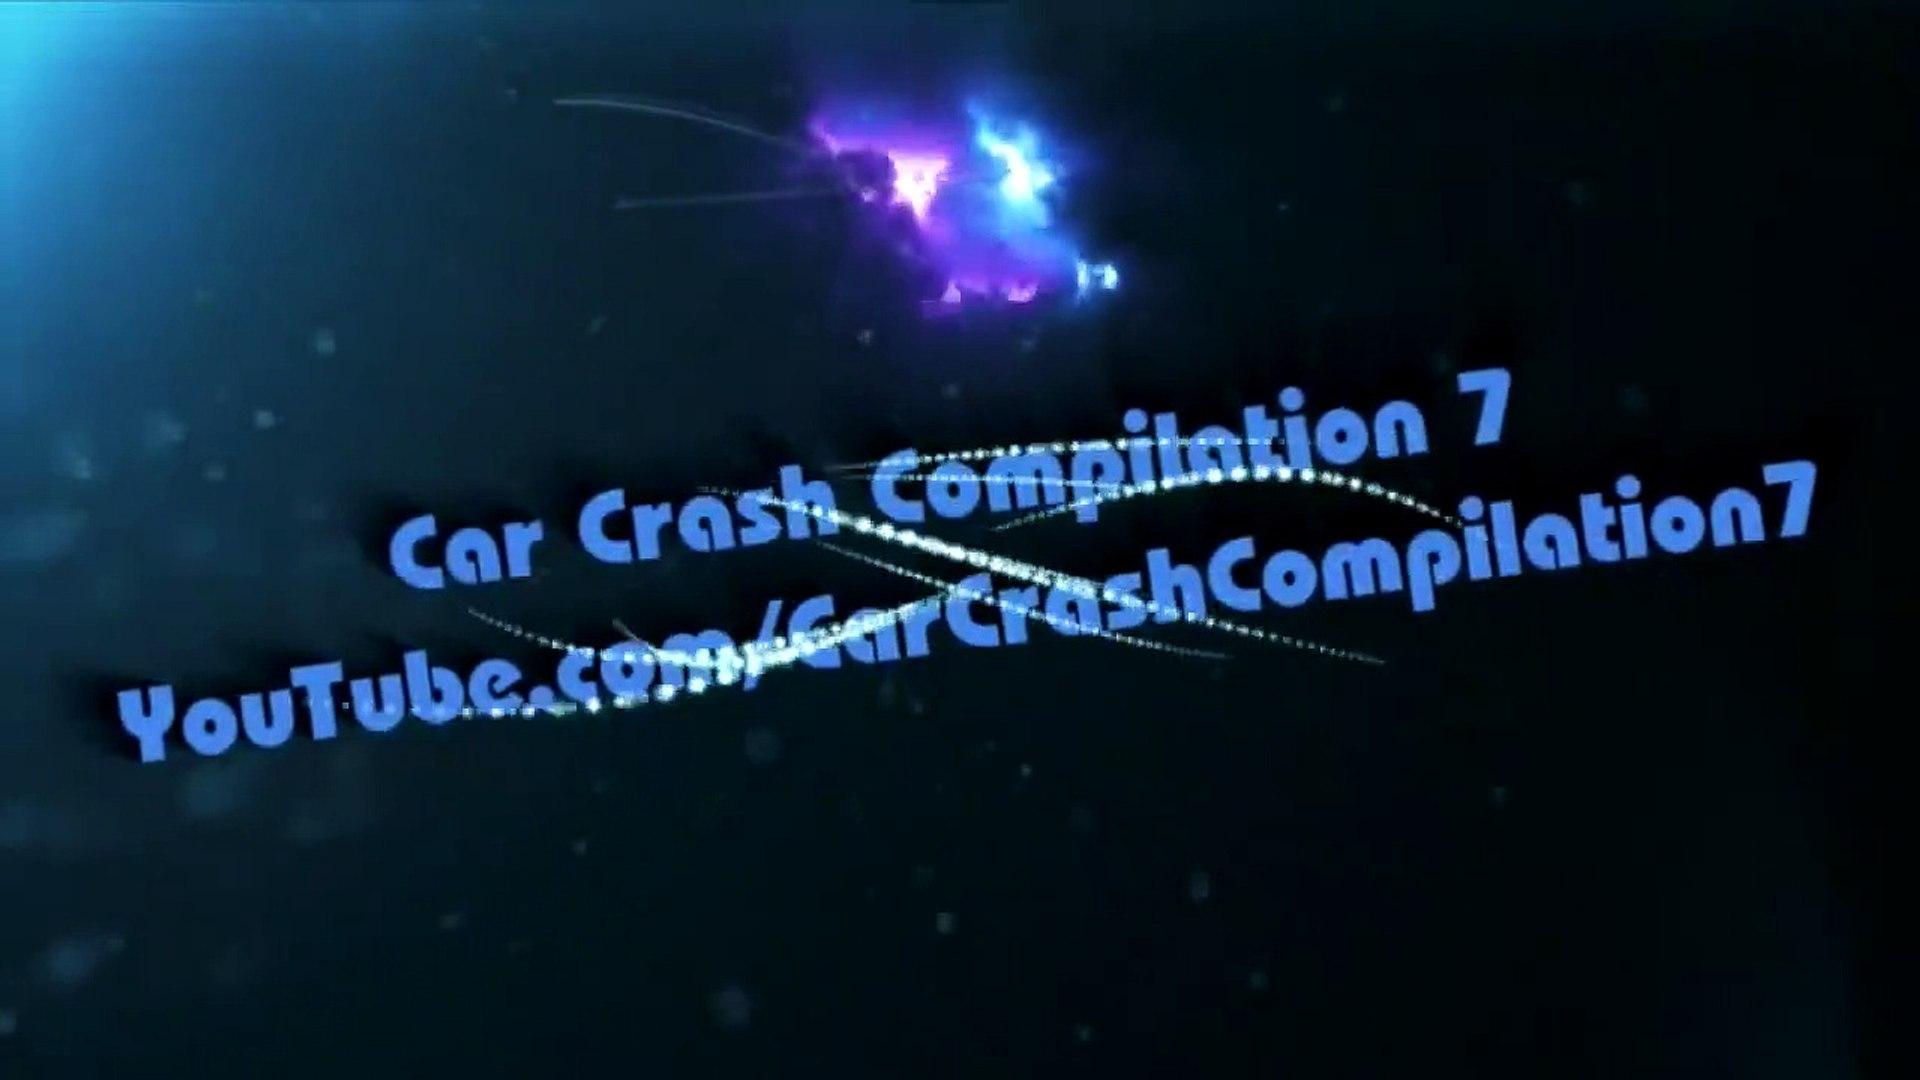 Car Crash Compilation 889 - Apr 20